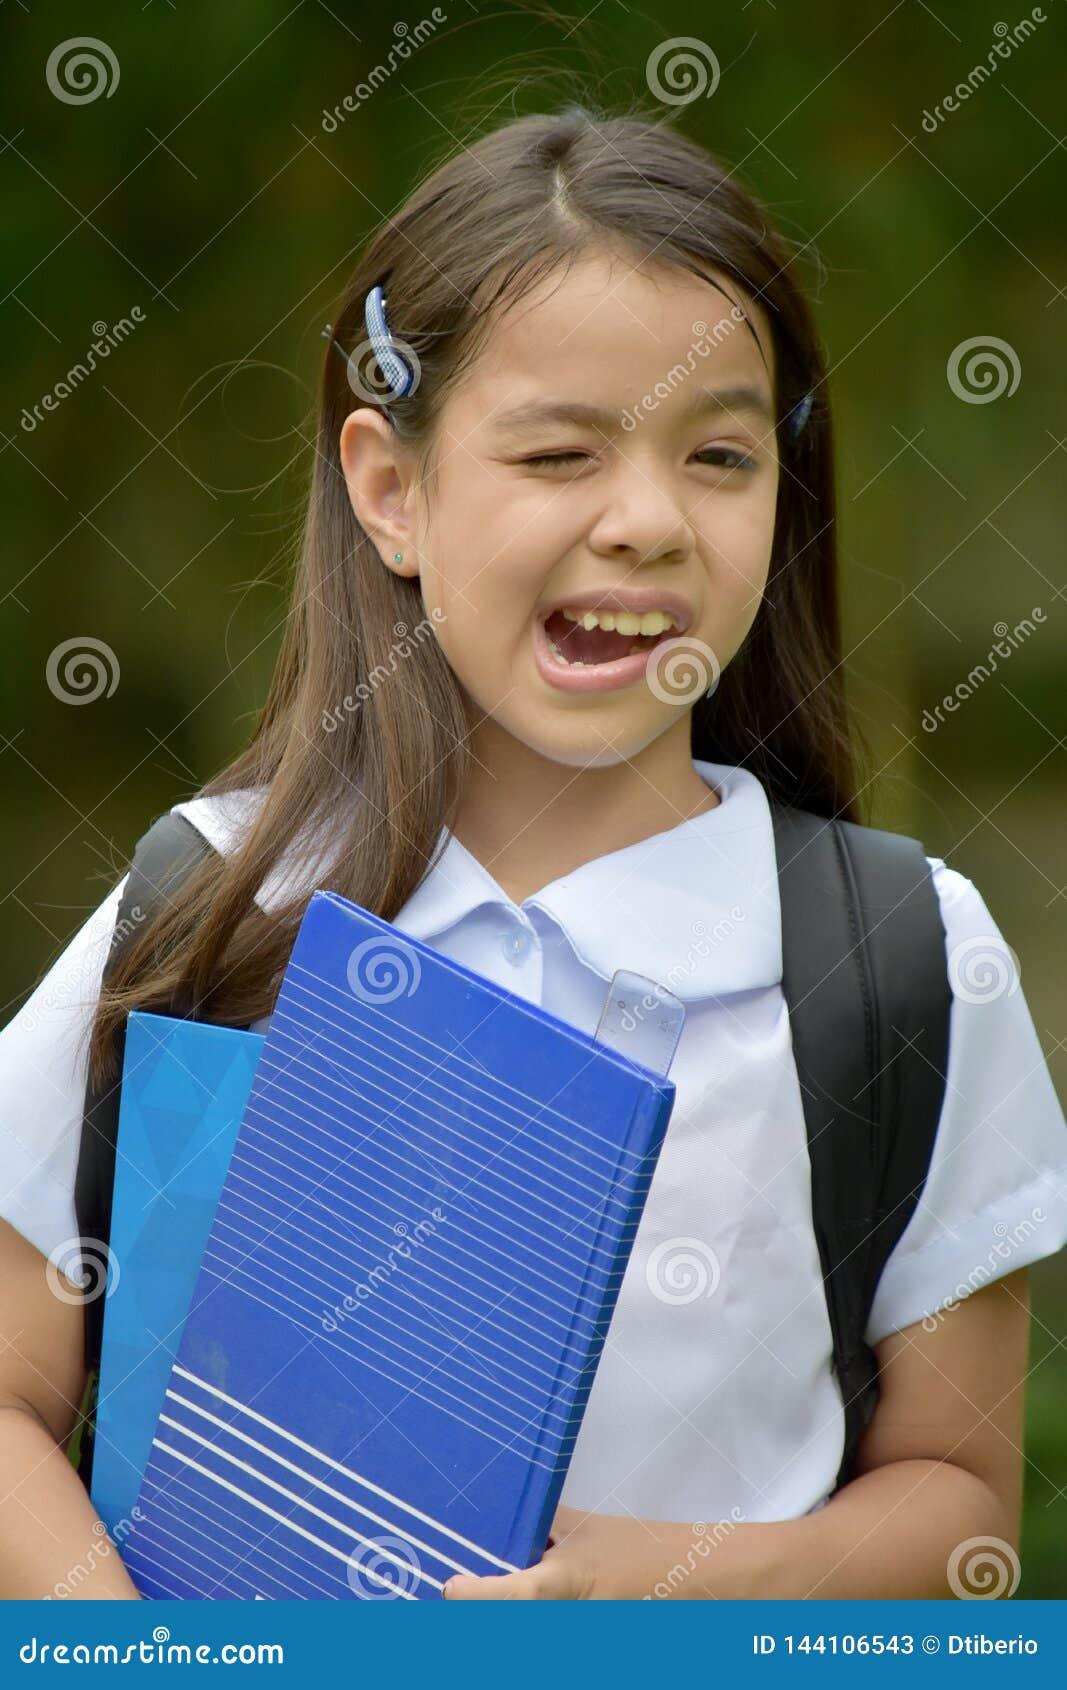 Catholic Minority Child Girl Student Making Funny Faces With